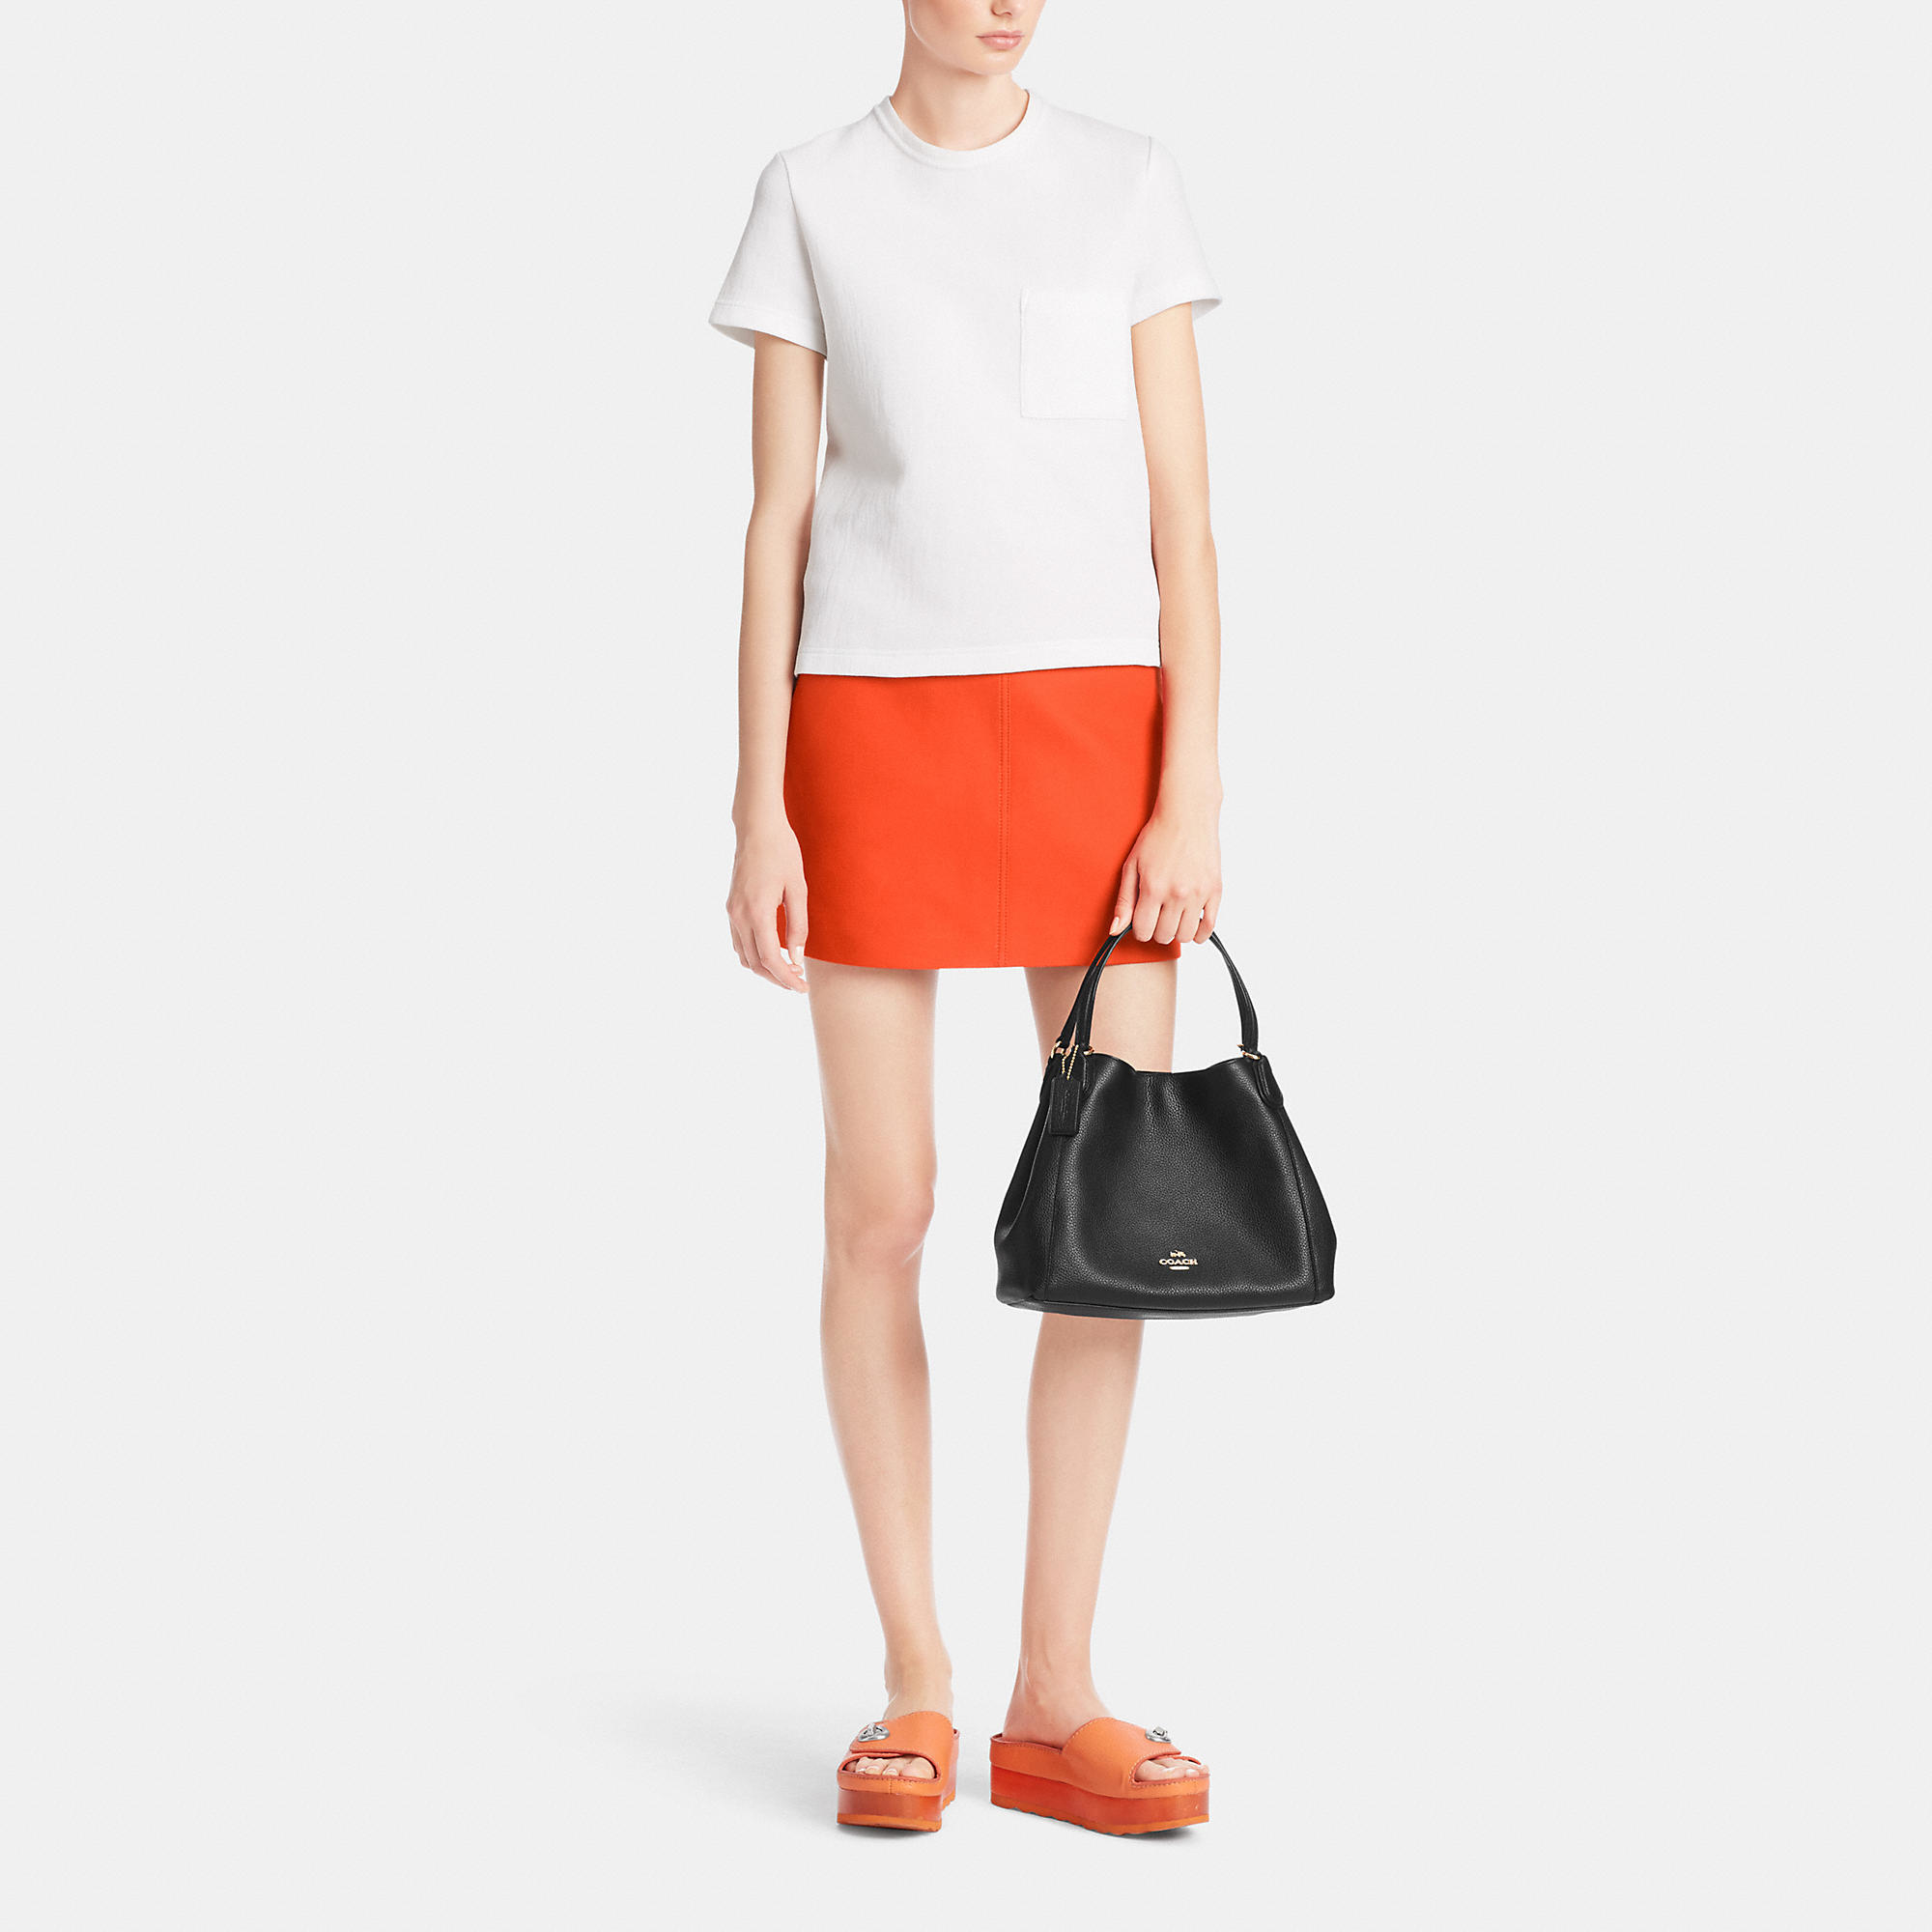 a906ec535 COACH Edie Shoulder Bag 28 In Pebble Leather - Lyst